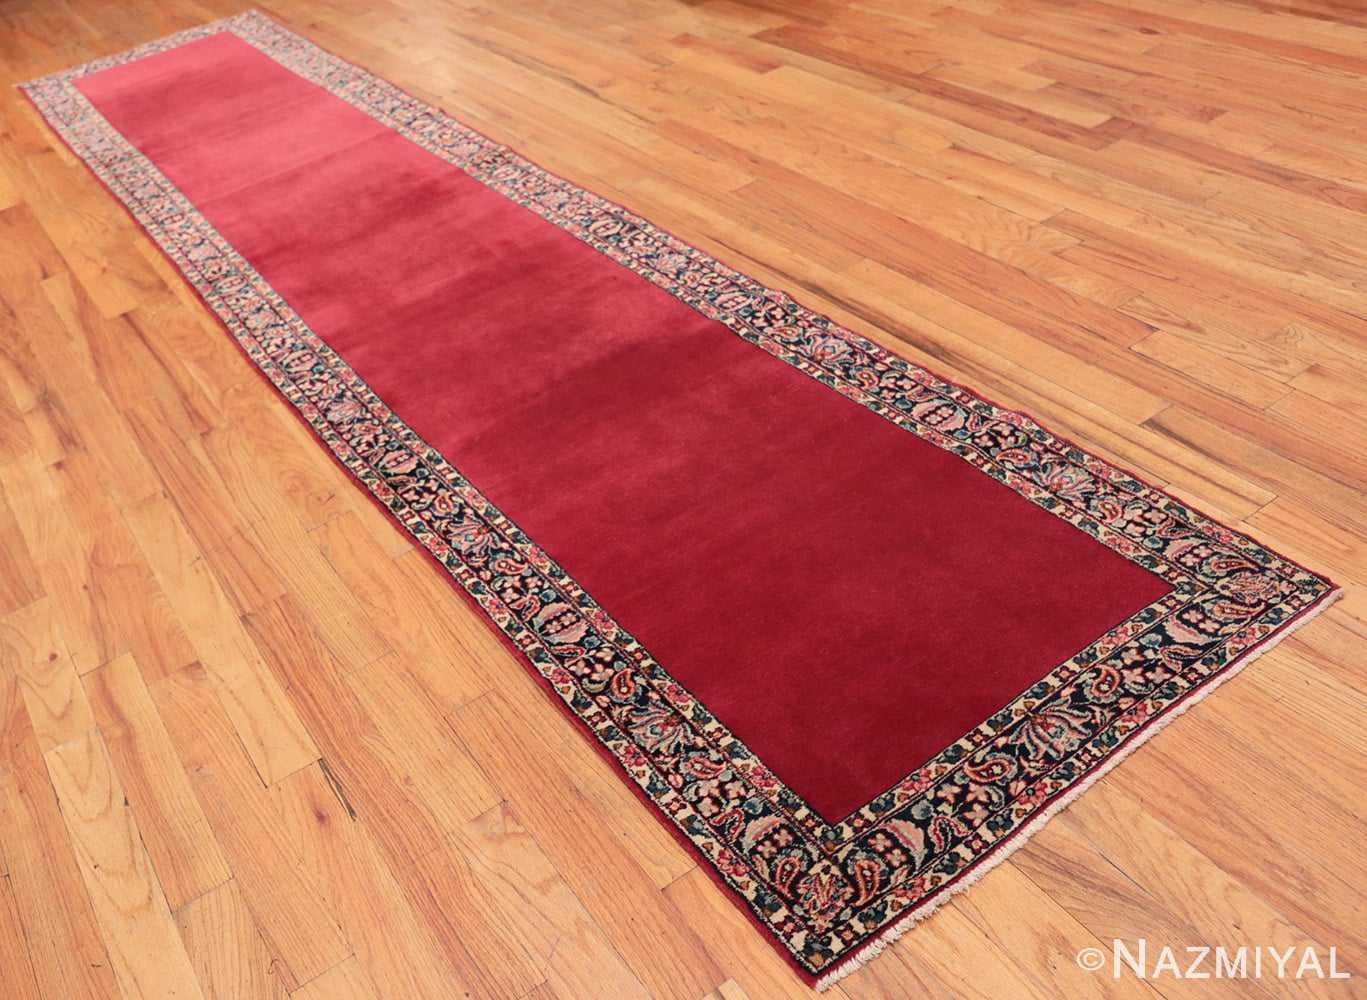 Vintage Red Color Persian Floral Kerman Runner Rug 50349